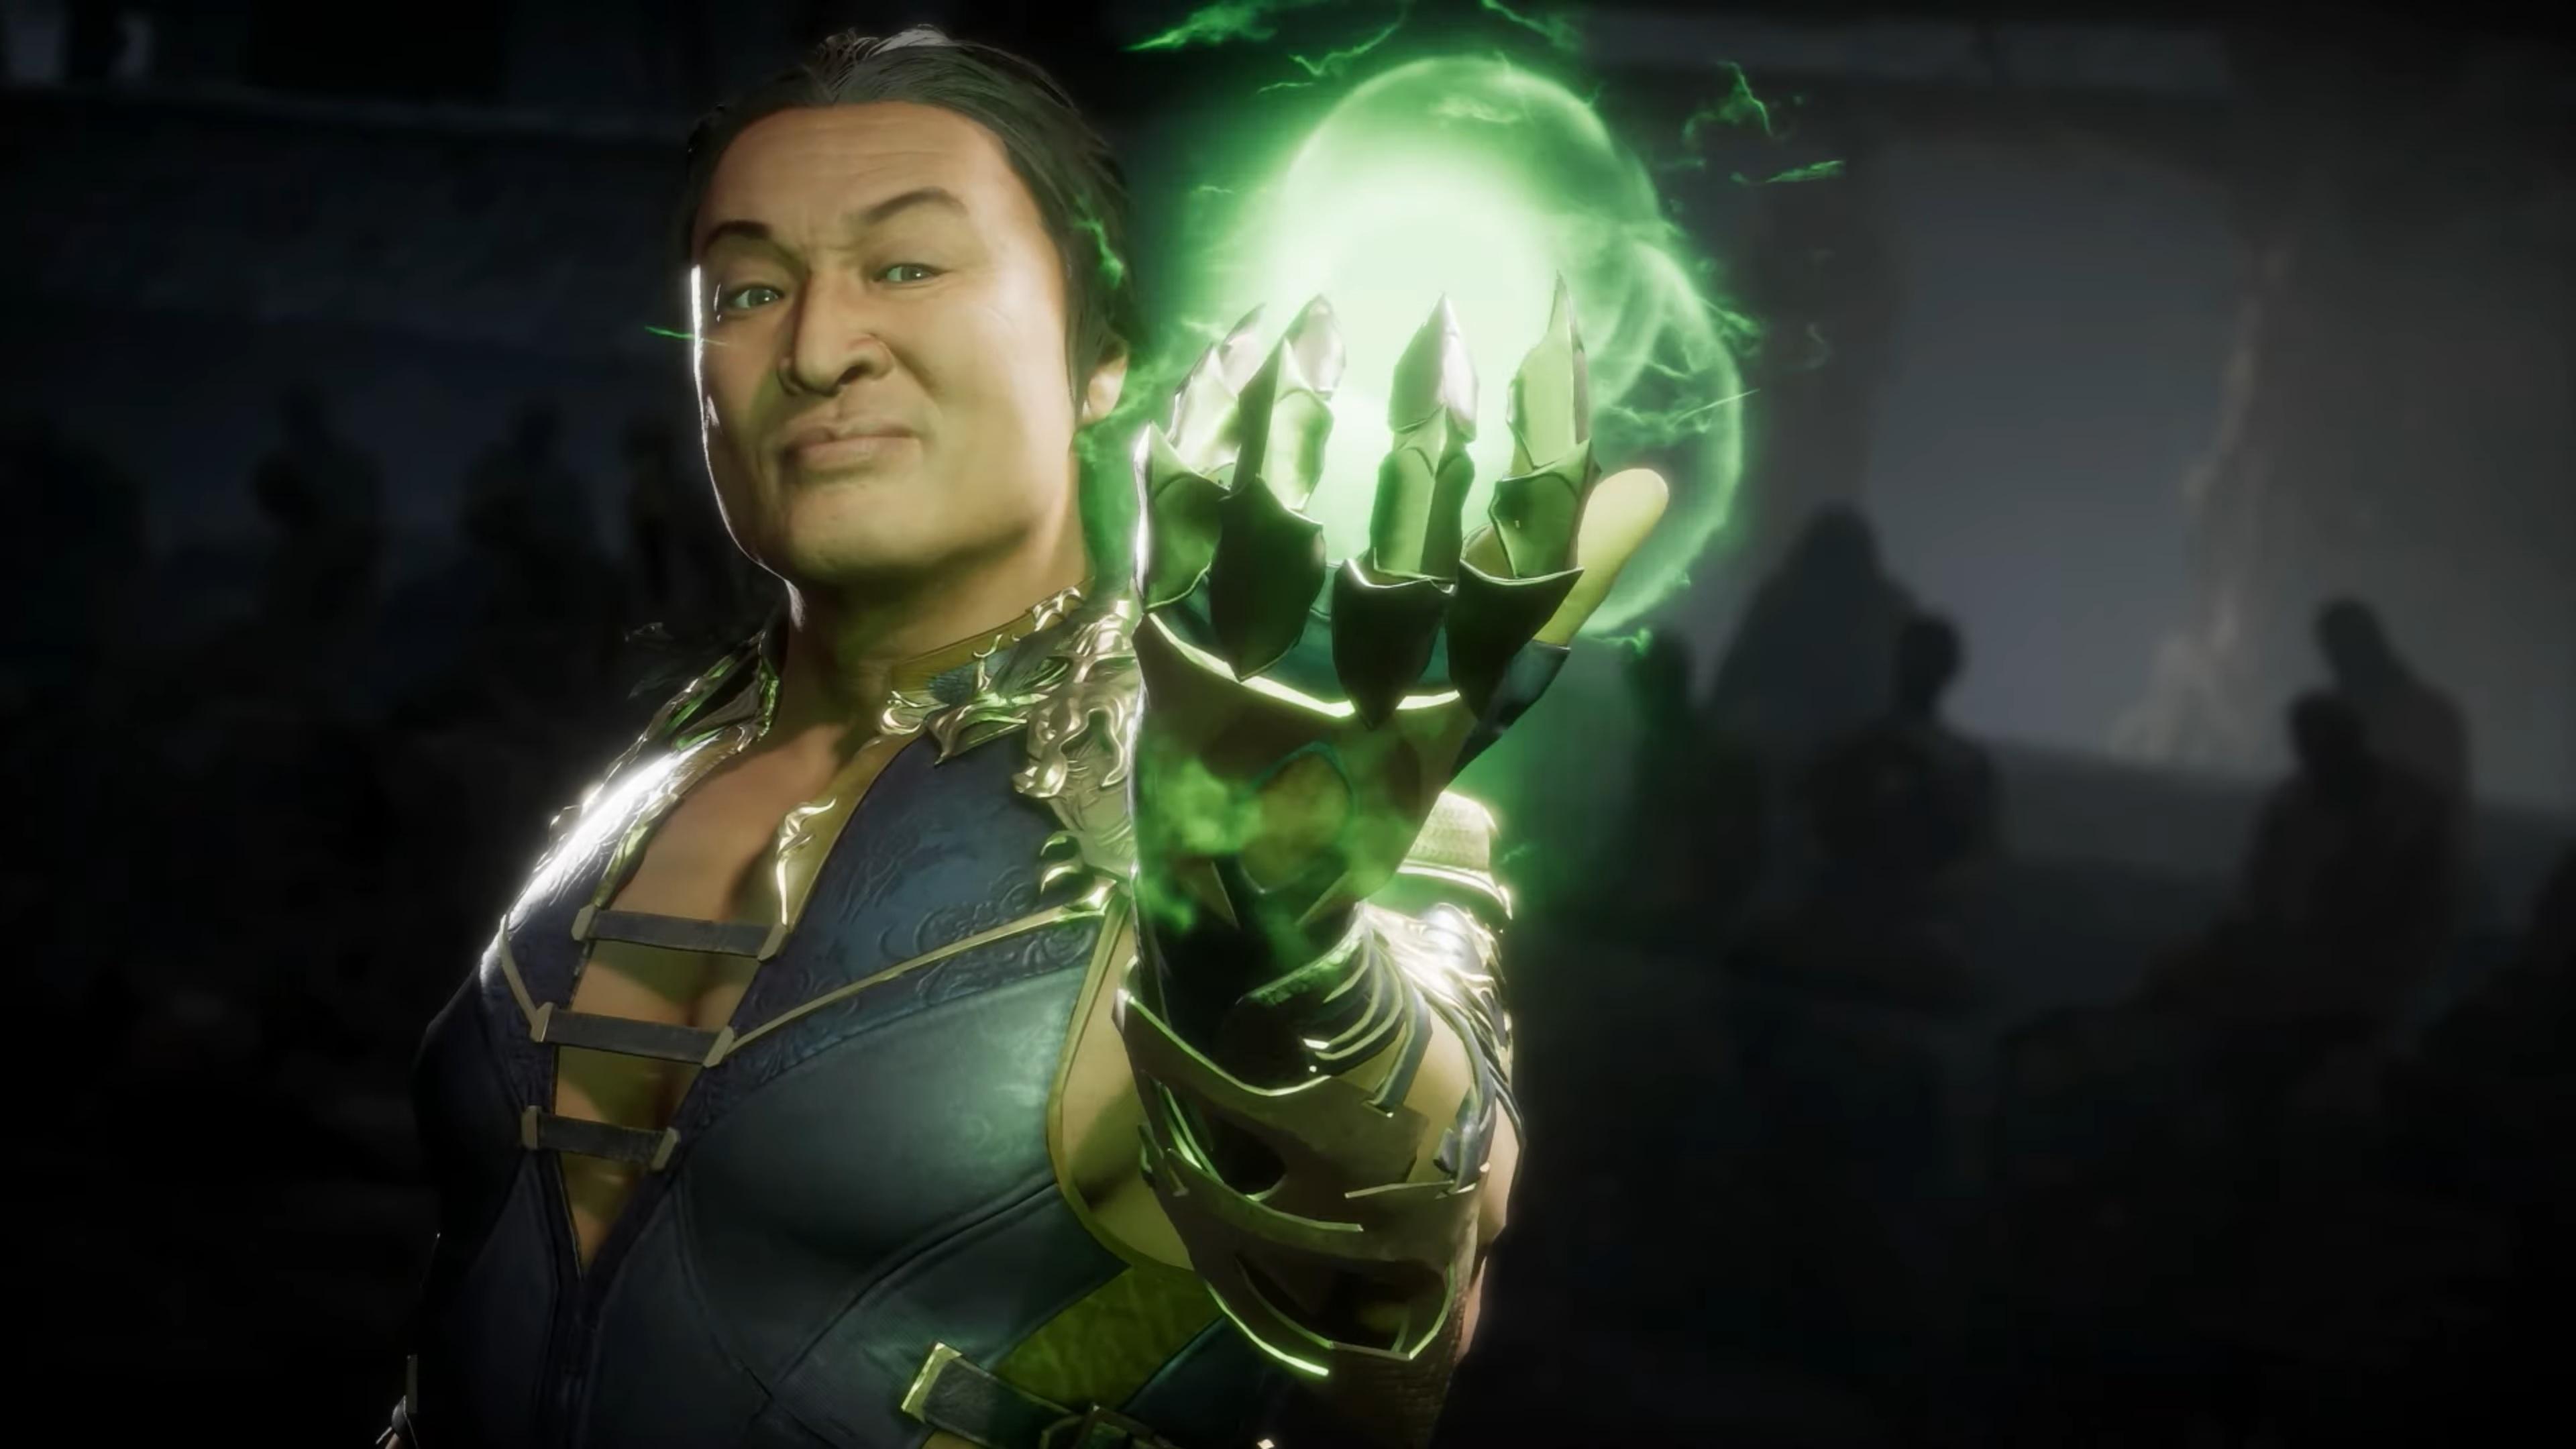 Mortal Kombat 11 Archives - Nintendo Everything